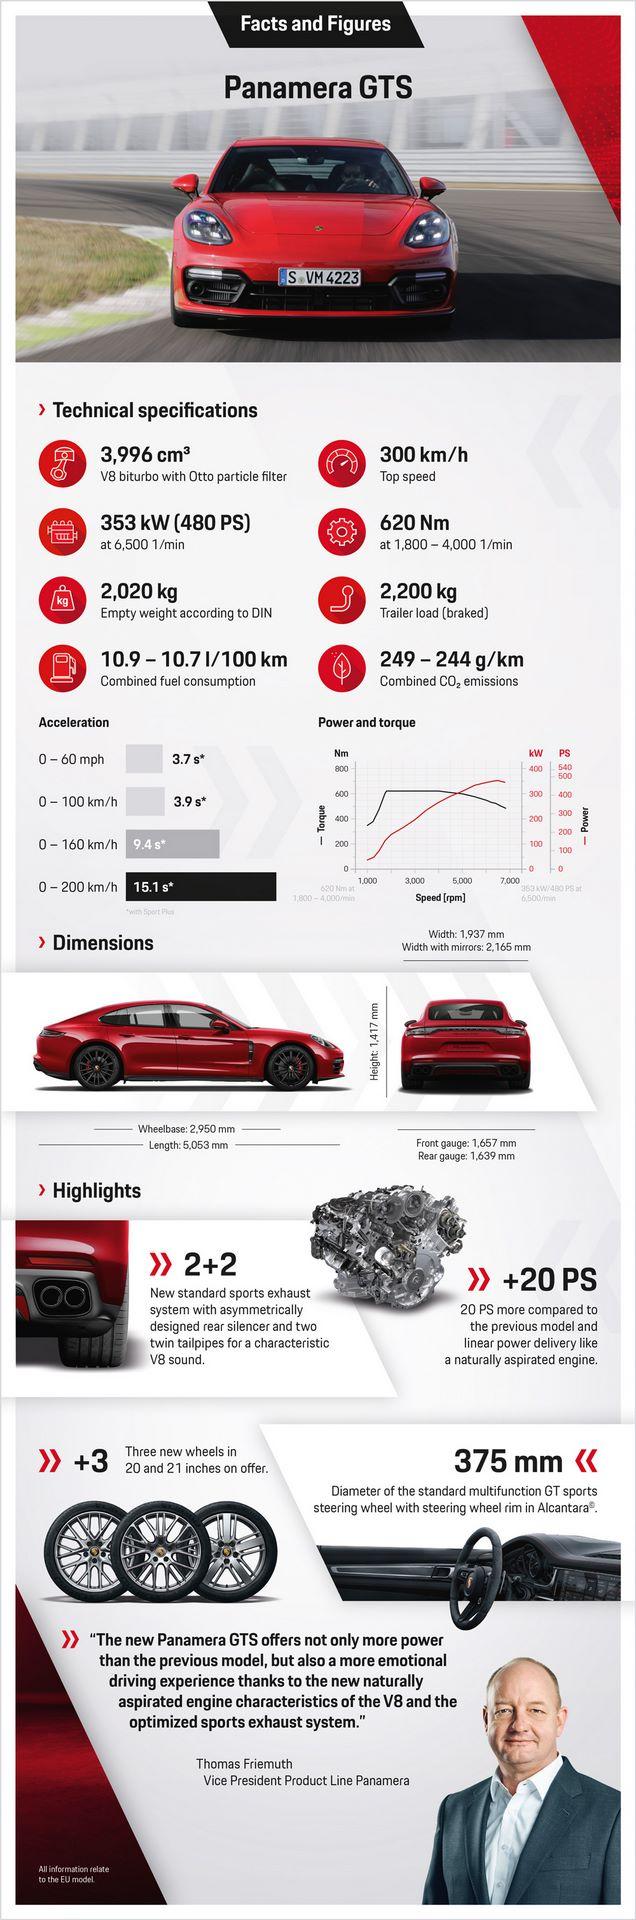 2020.08.24_PORSCHE_Infografik_Panamera_GTS_EN_v5.indd